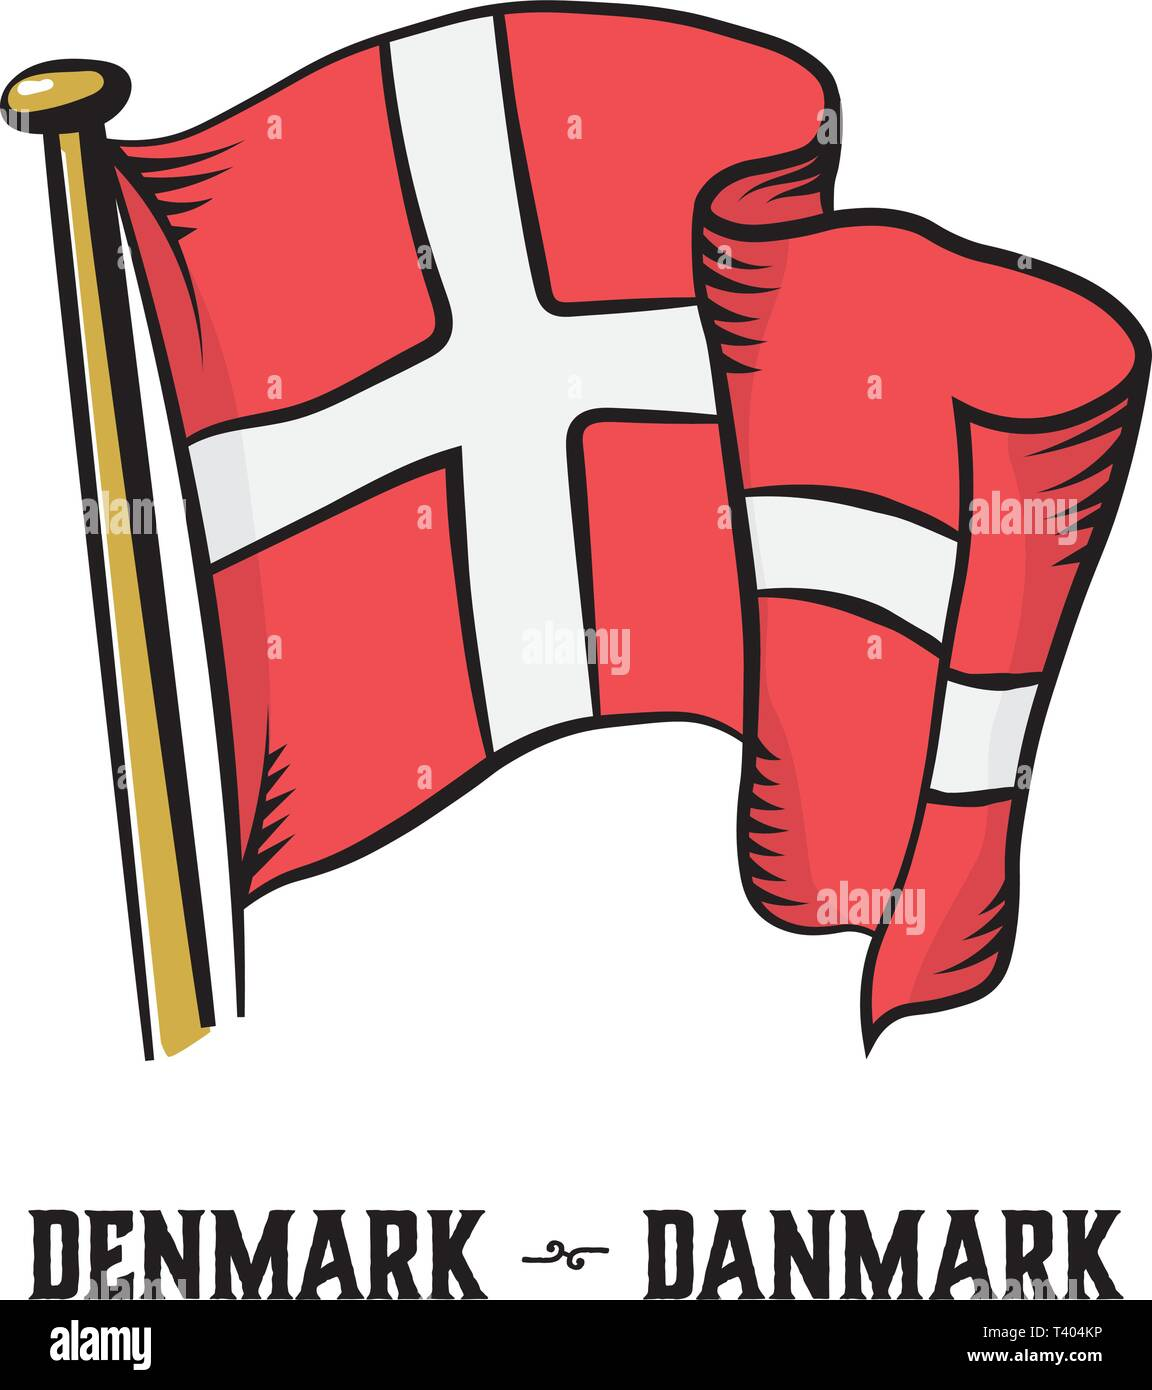 Vintage engraving style Denmark flag vector illustration - Stock Image